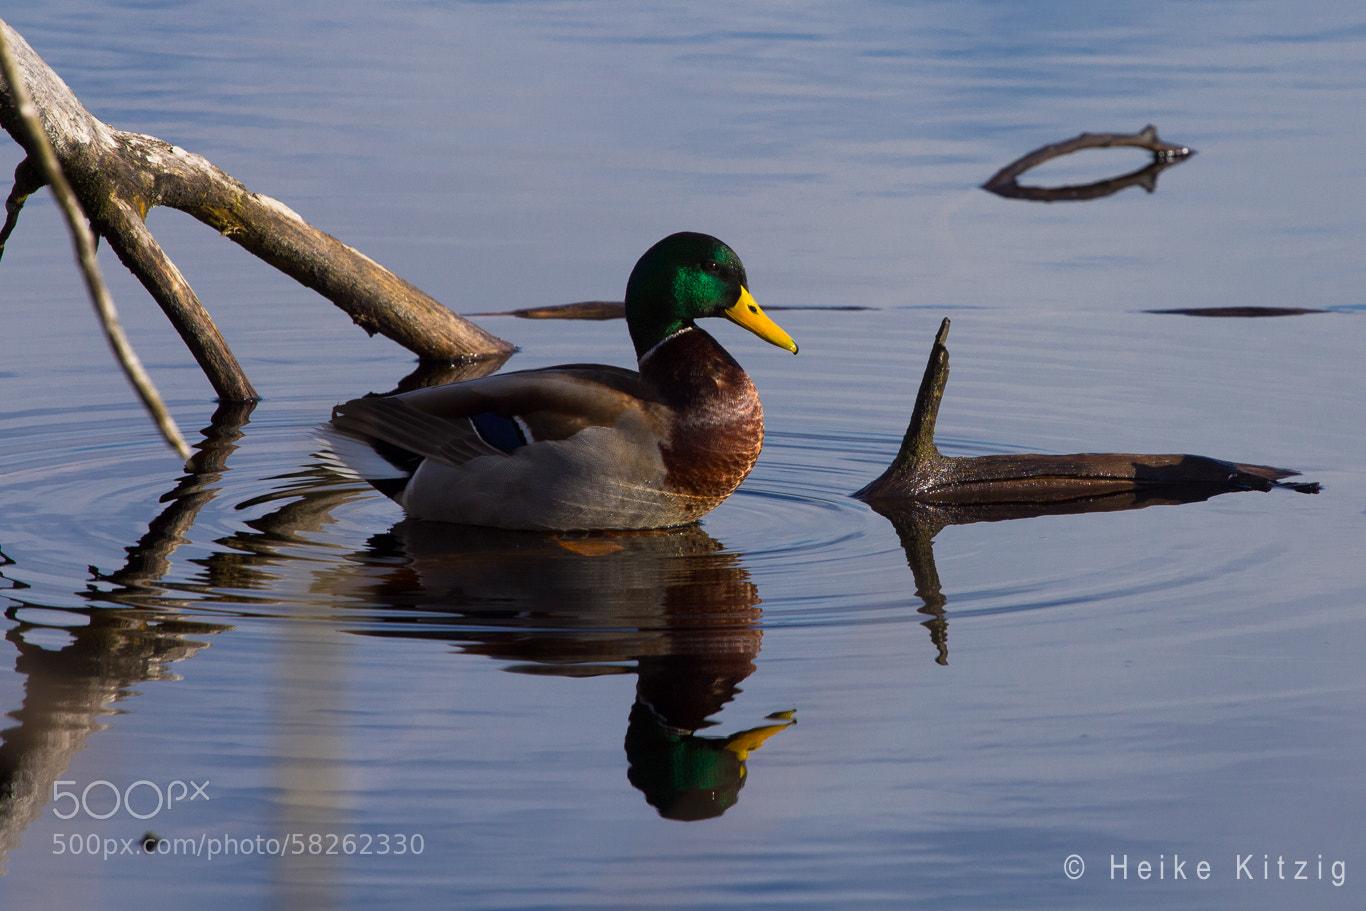 Photograph Wild duck Moss in Schwenningen Germany by Heike Kitzig on 500px